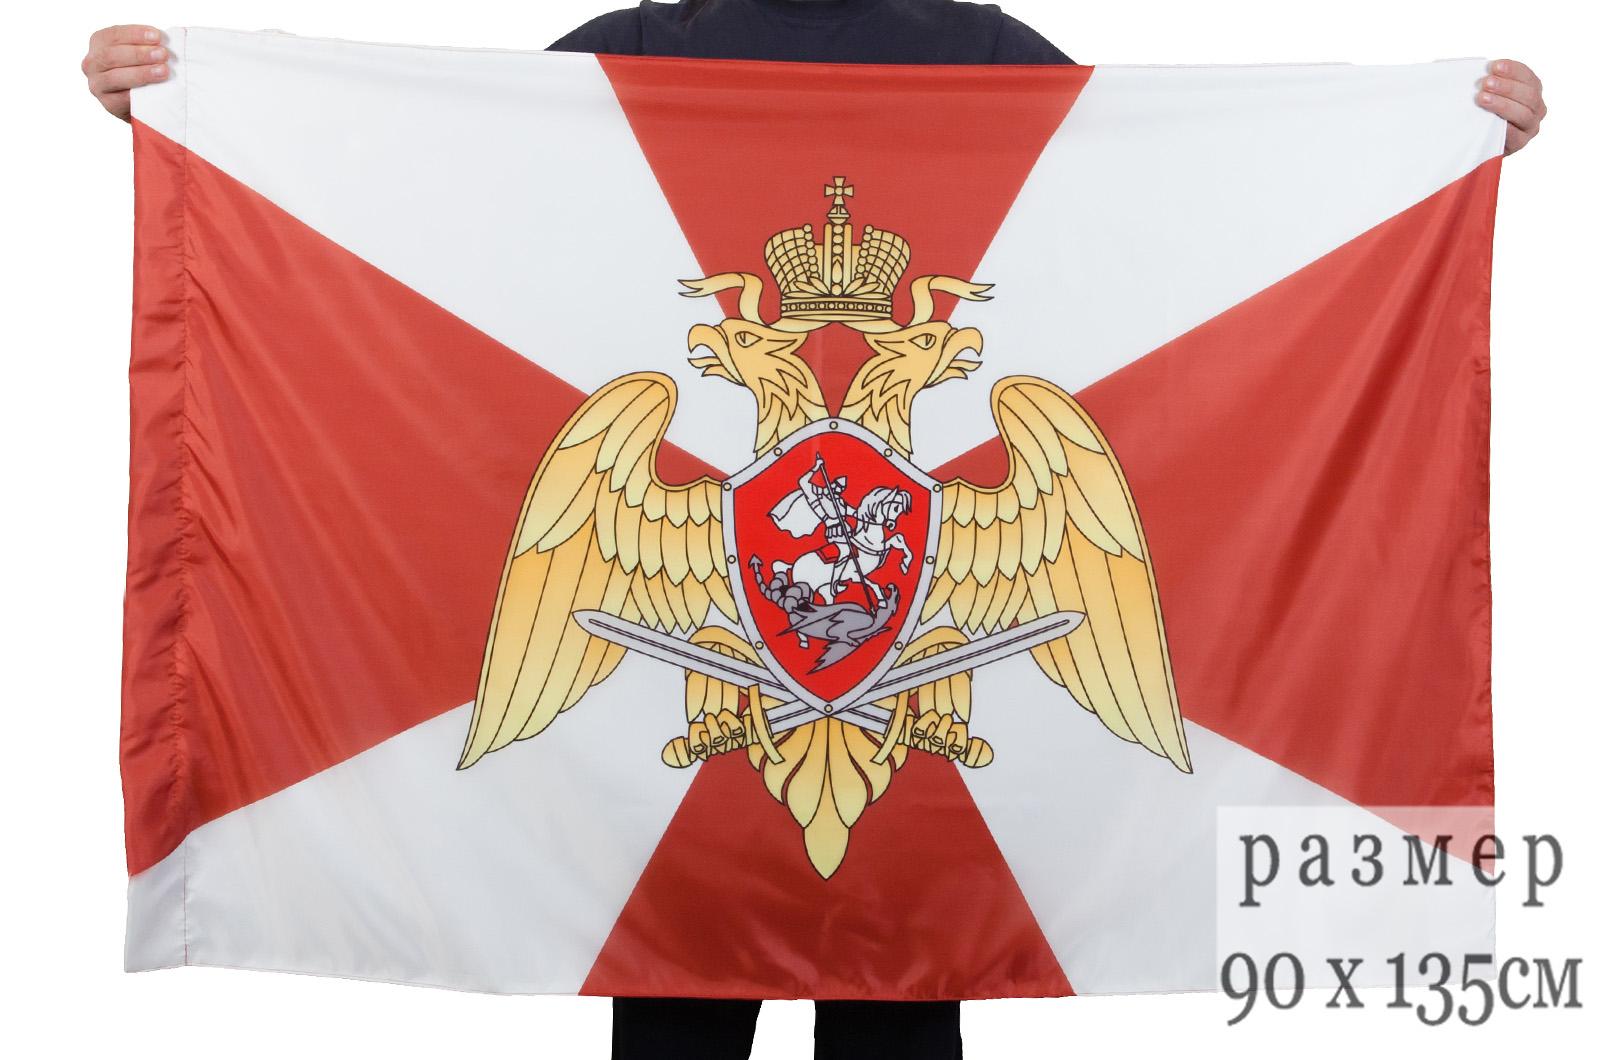 Флаг Нацгвардии России | Купить флаги Нацгвардии РФ нового образца